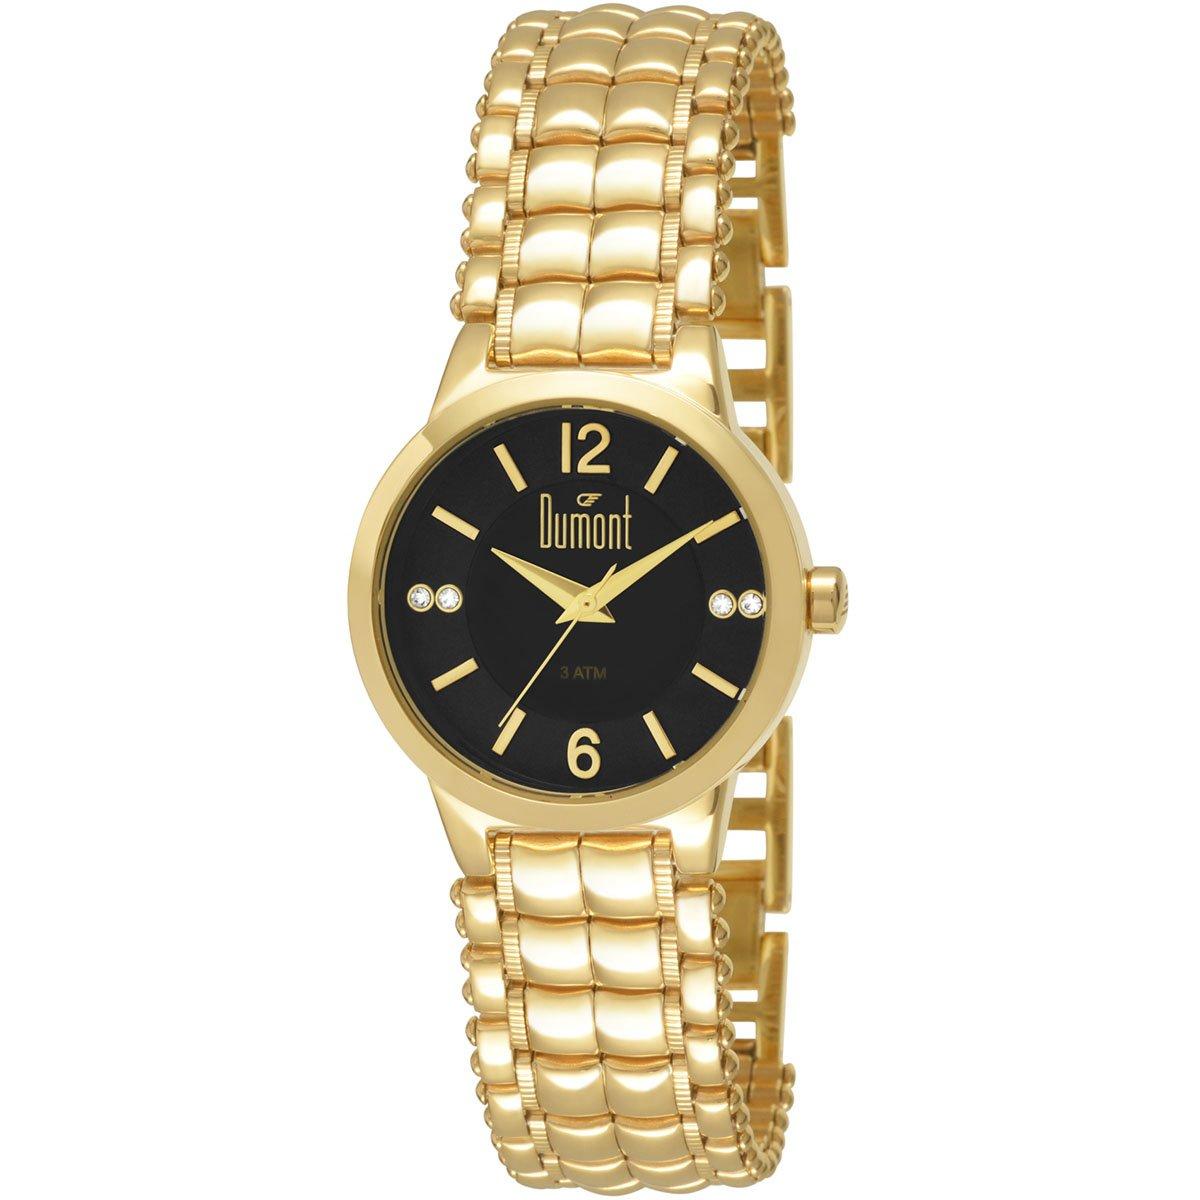 Relógio Dumont Analógico Pedras - Compre Agora   Zattini 6ca4ffe939